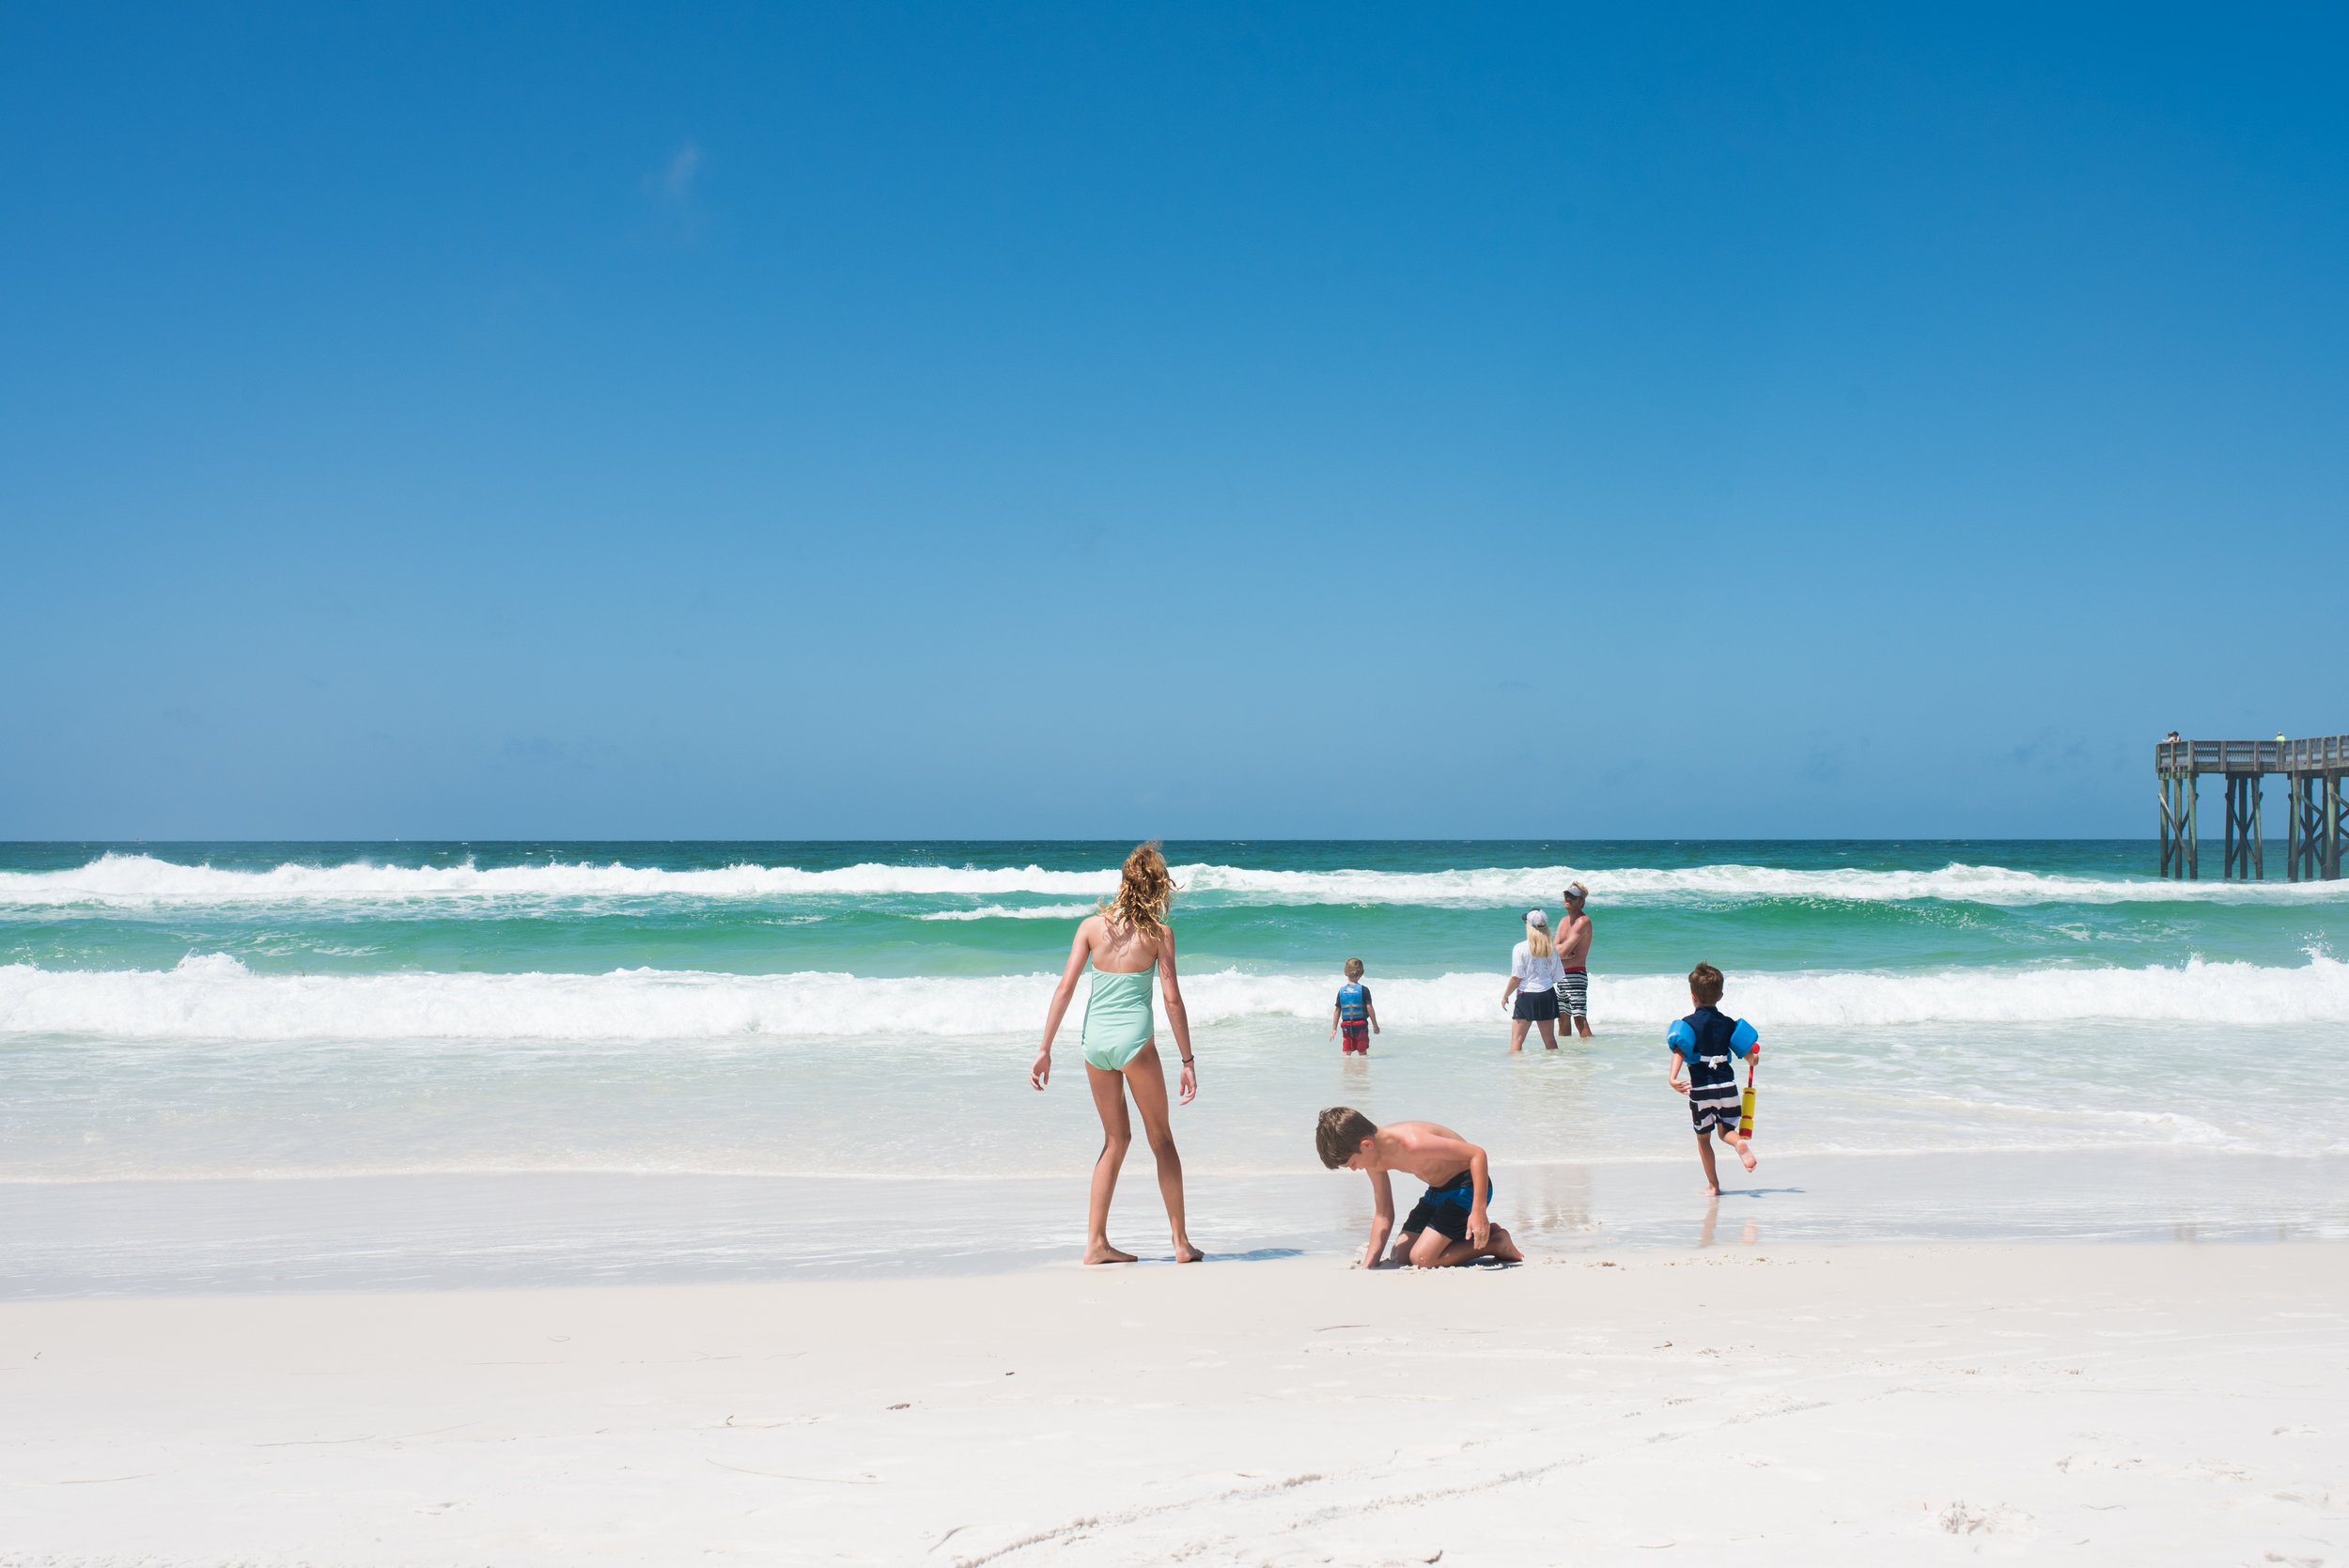 Sun! Beach!